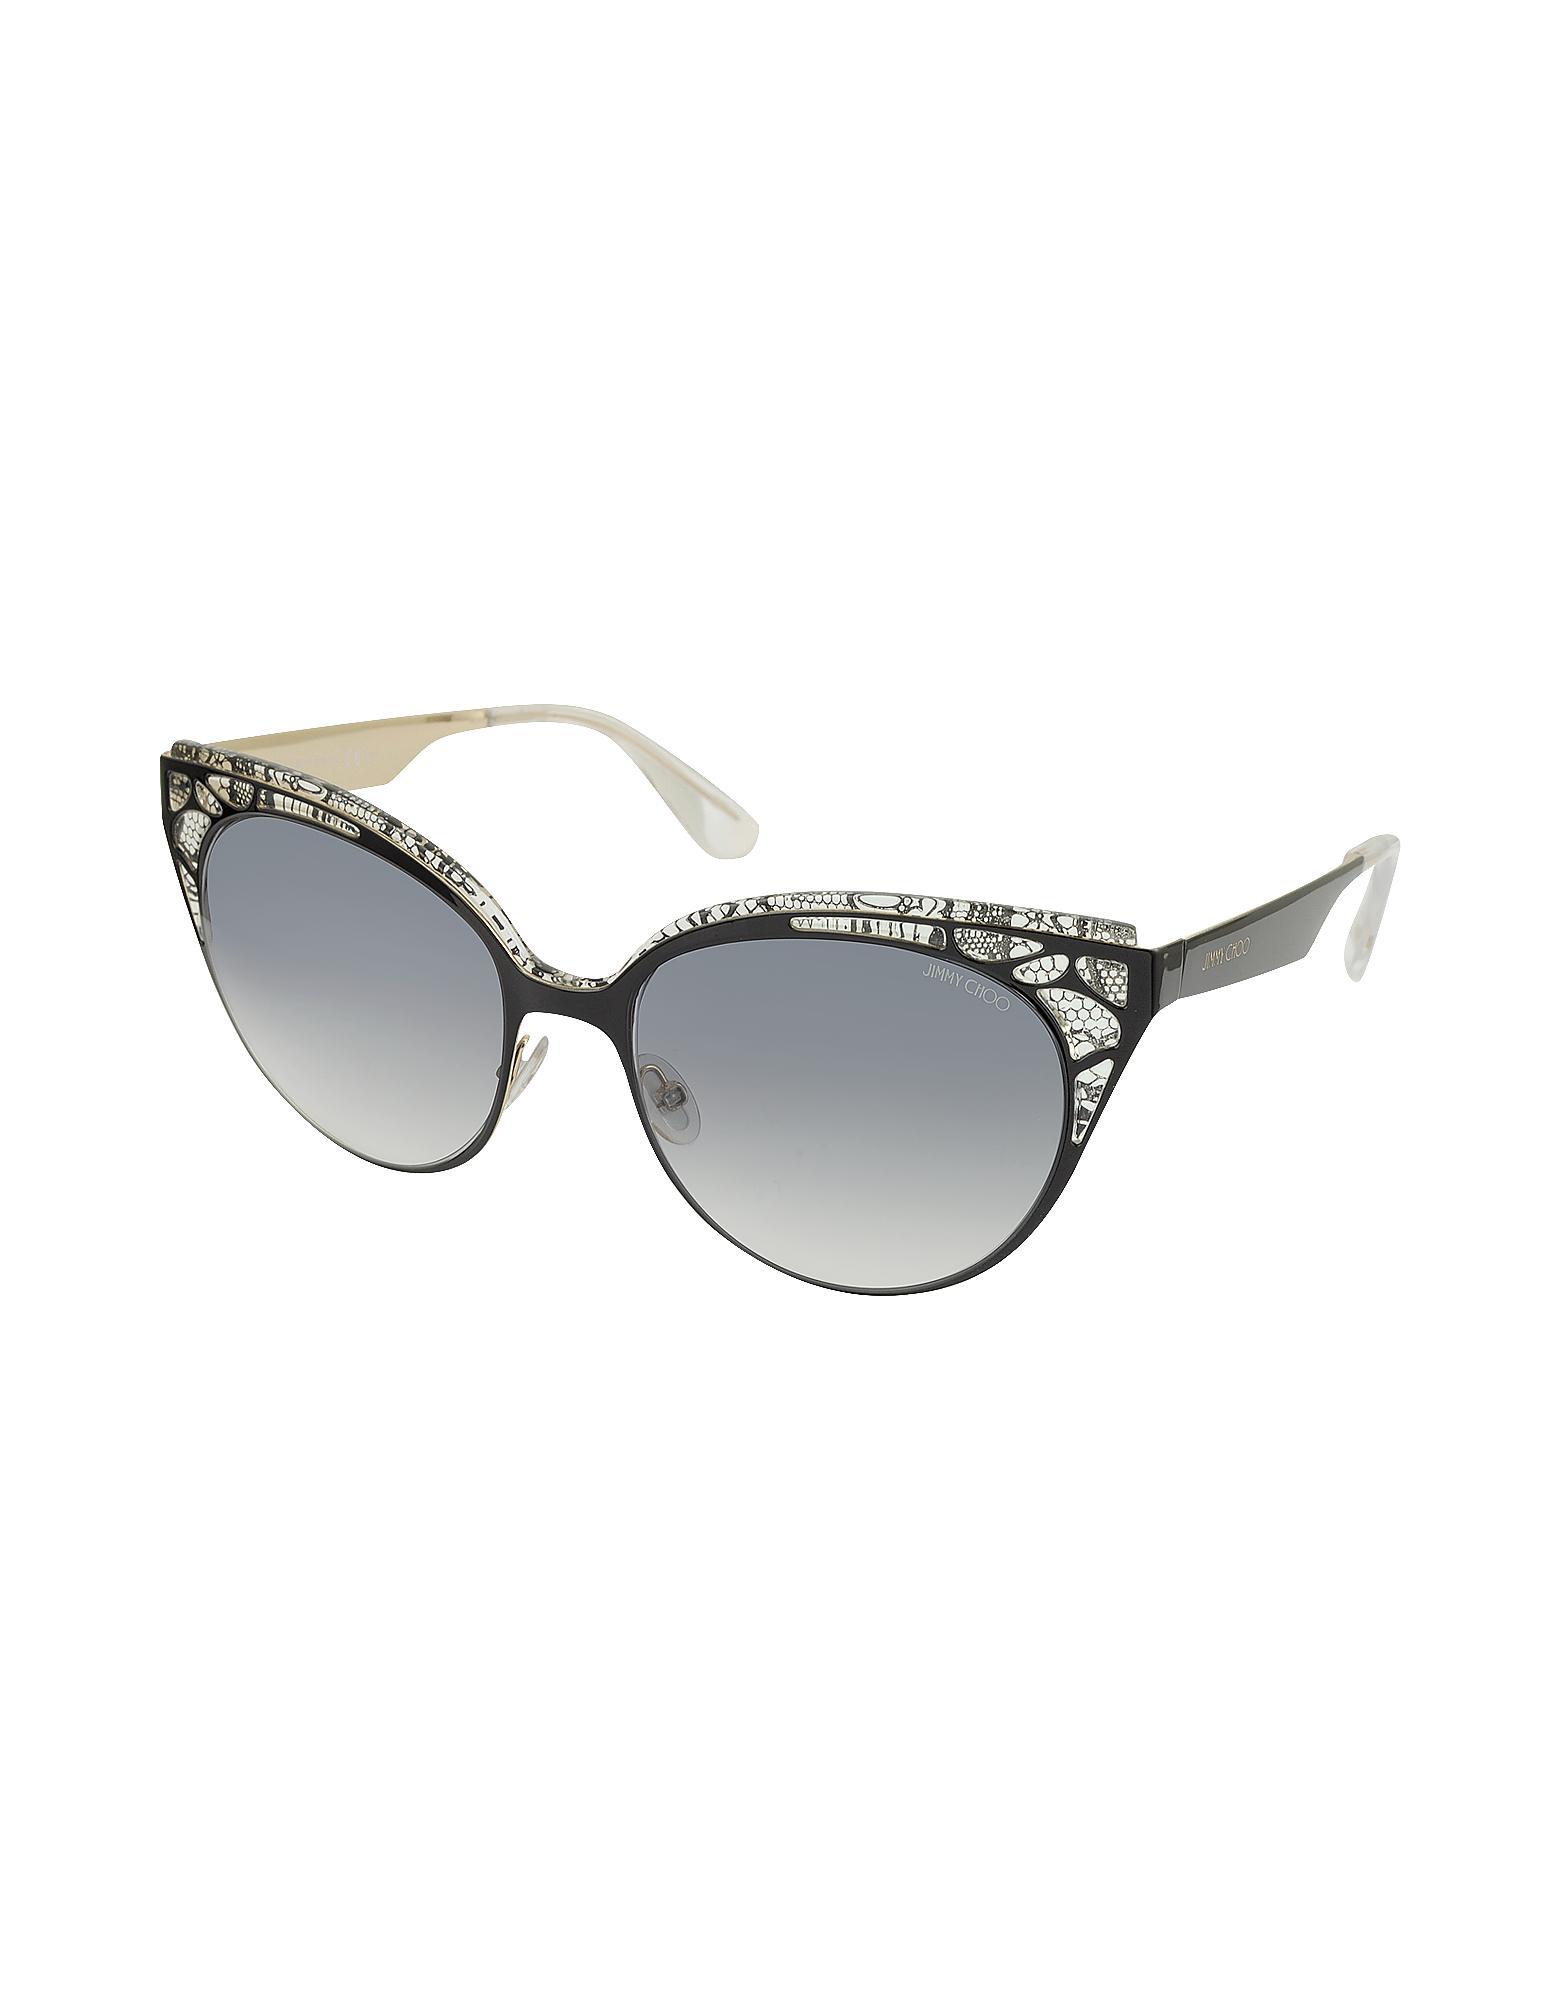 d2a224bbe0bc Lyst - Jimmy Choo Estelle s Enylf Black Metal Lace Cat Eye Sunglasses in  Black